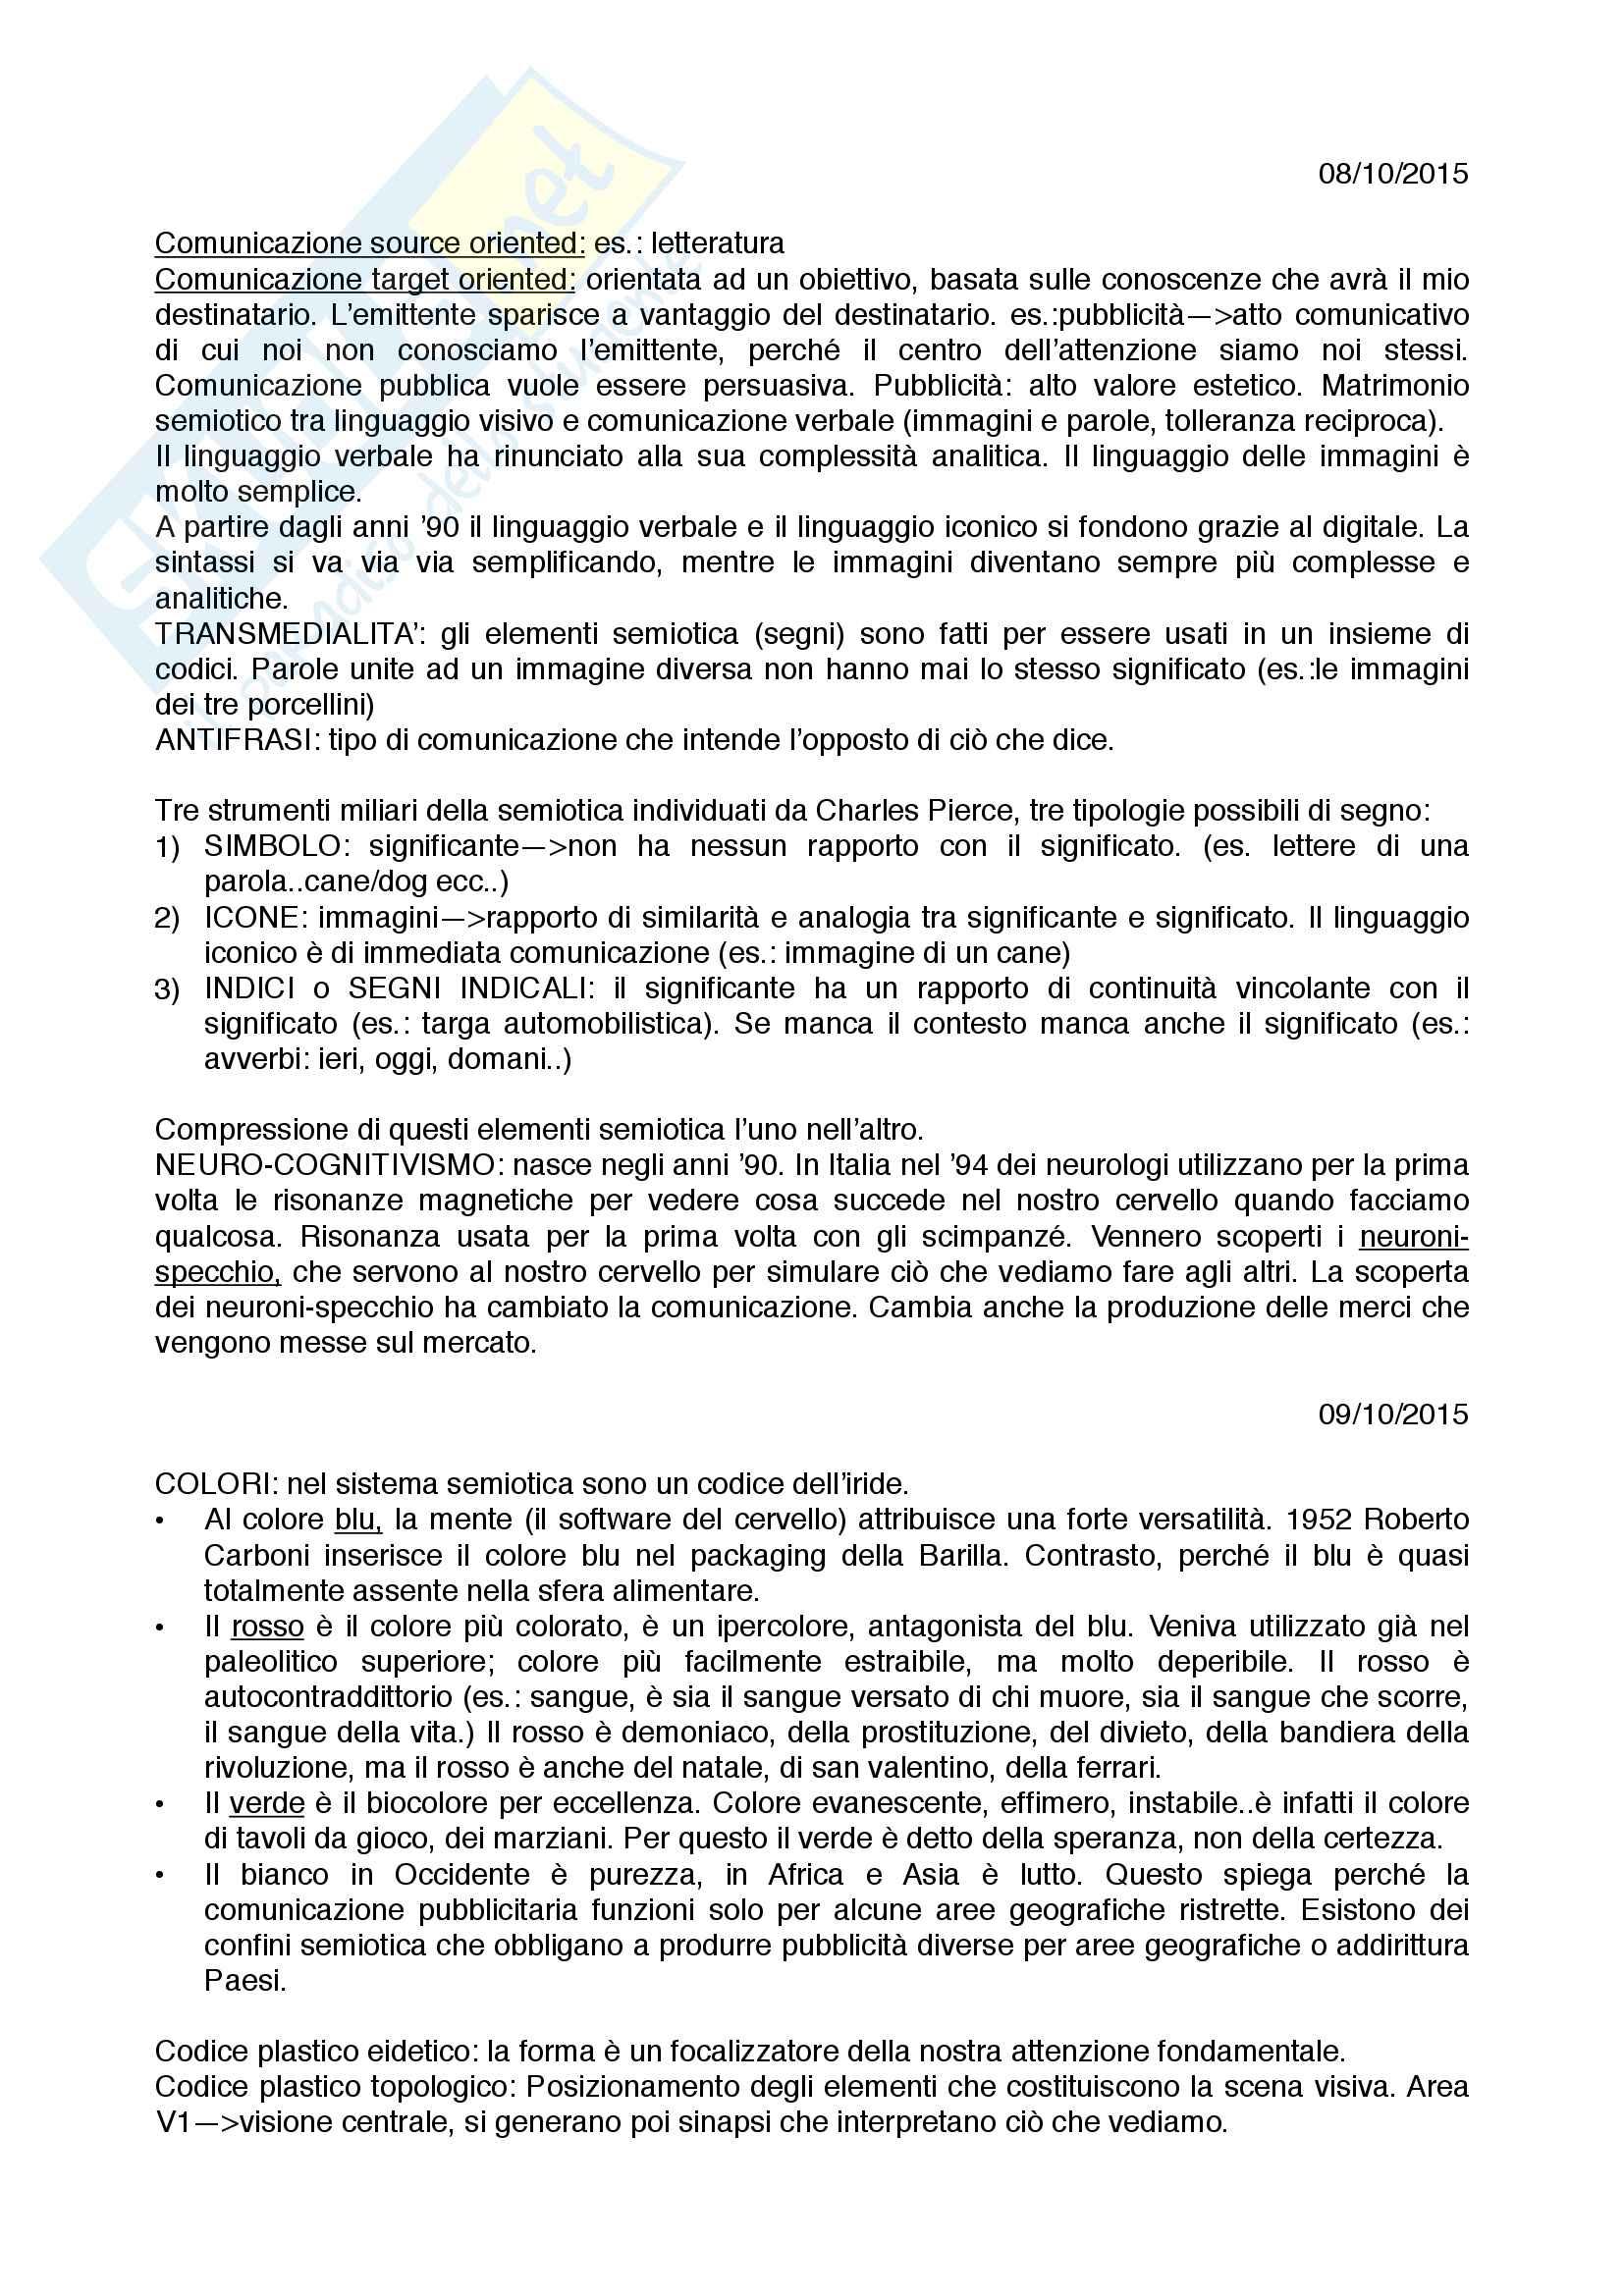 Appunti Corso di Semiotica Prof. Calabrese, IULM